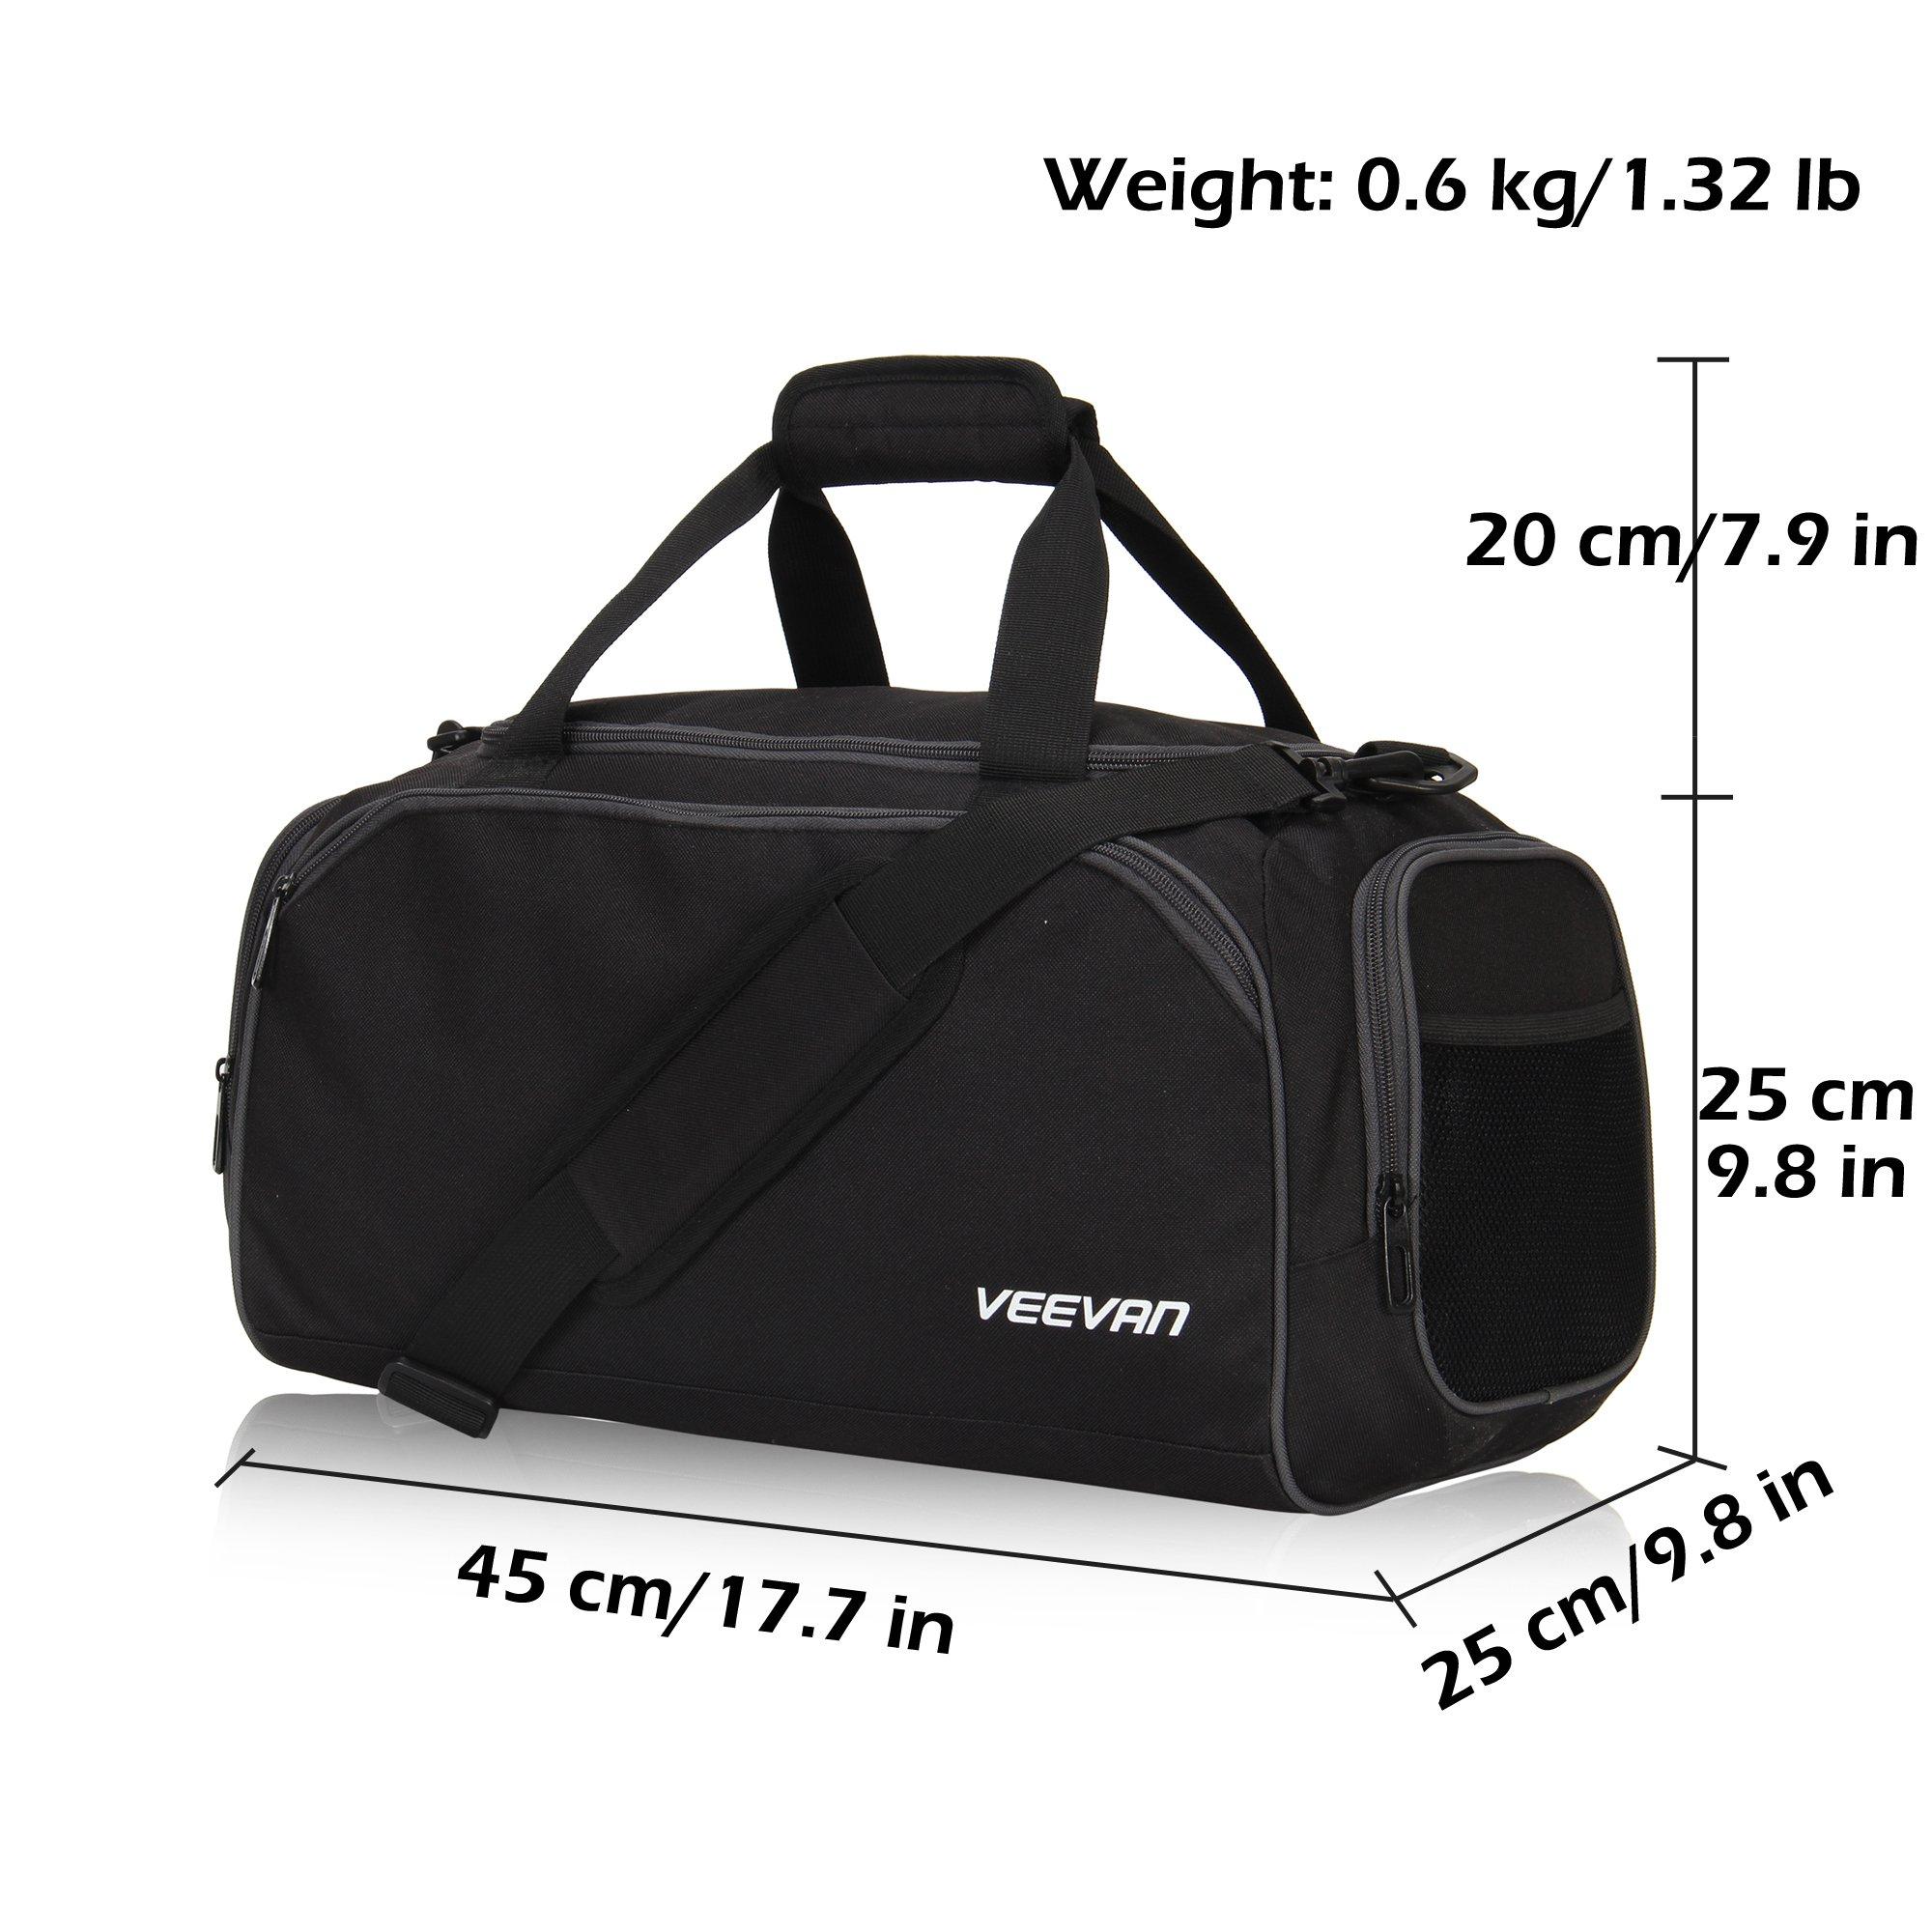 f79b1705f2f0 Galleon - Veevanpro 18 Inch Small Gym Bag Travel Sports Duffel Bag Carry On  Black